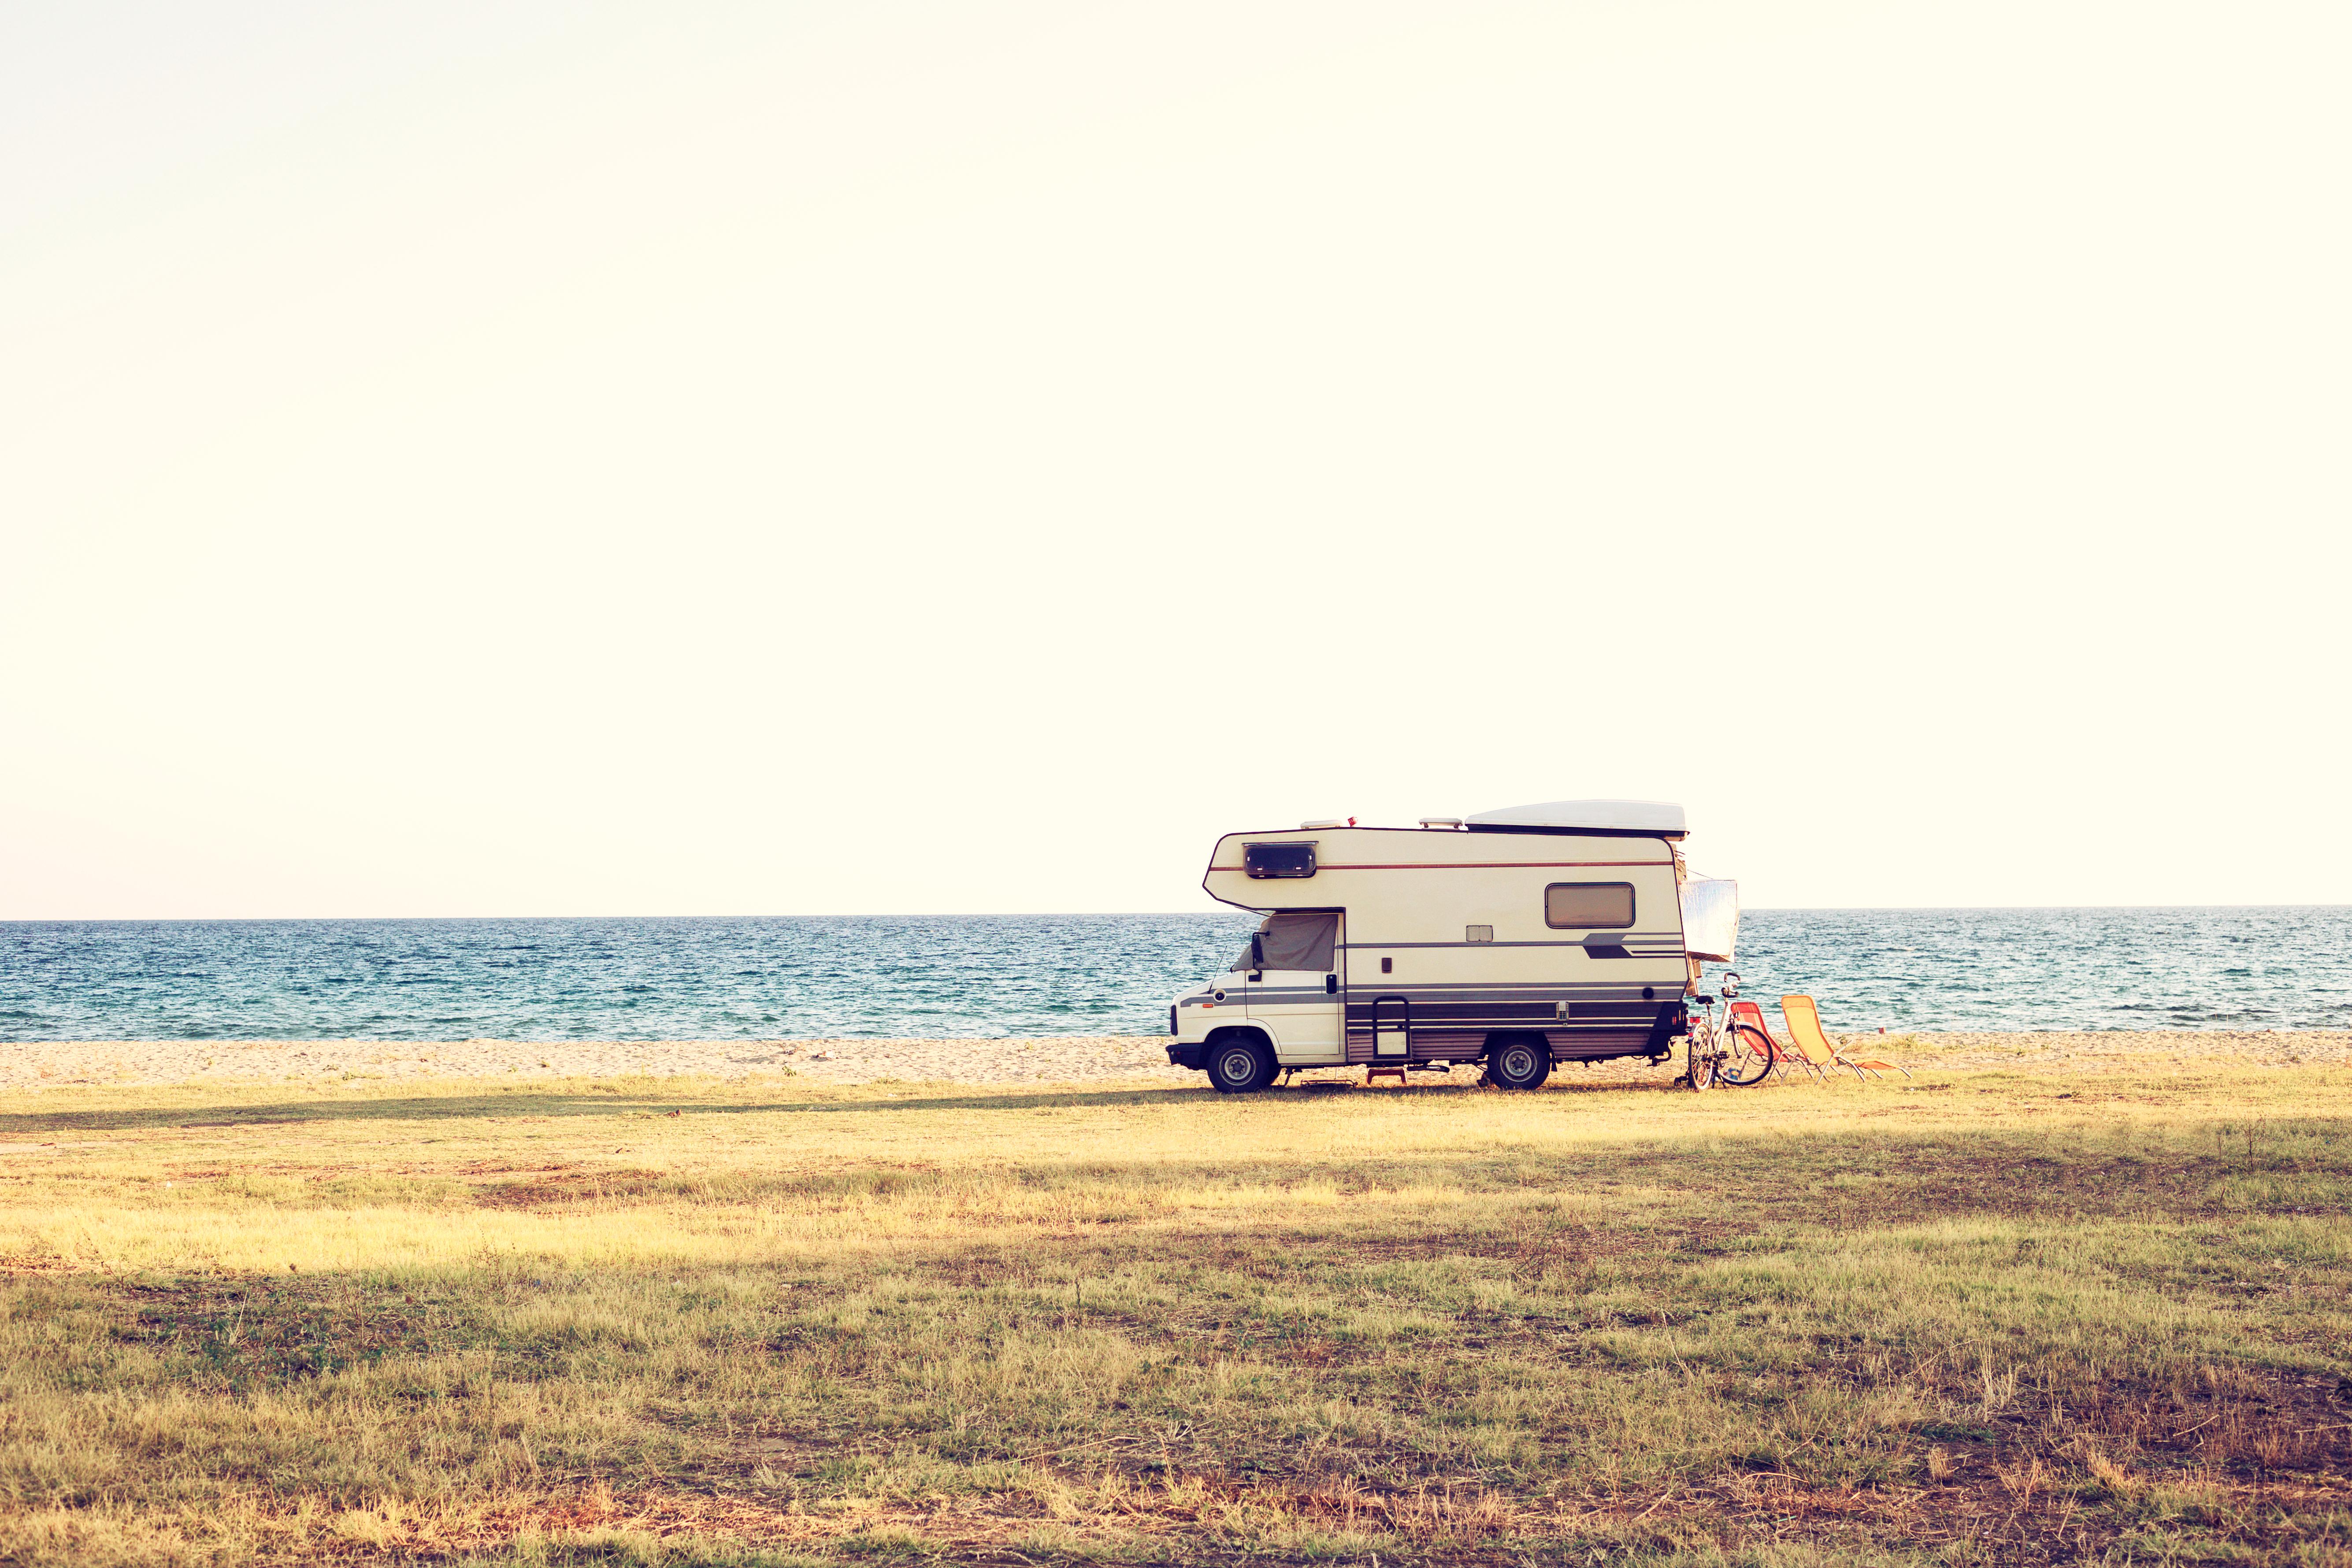 A vintage shoot with a motorhome caravan car near the Mediterranean sea in a beautiful summer day.